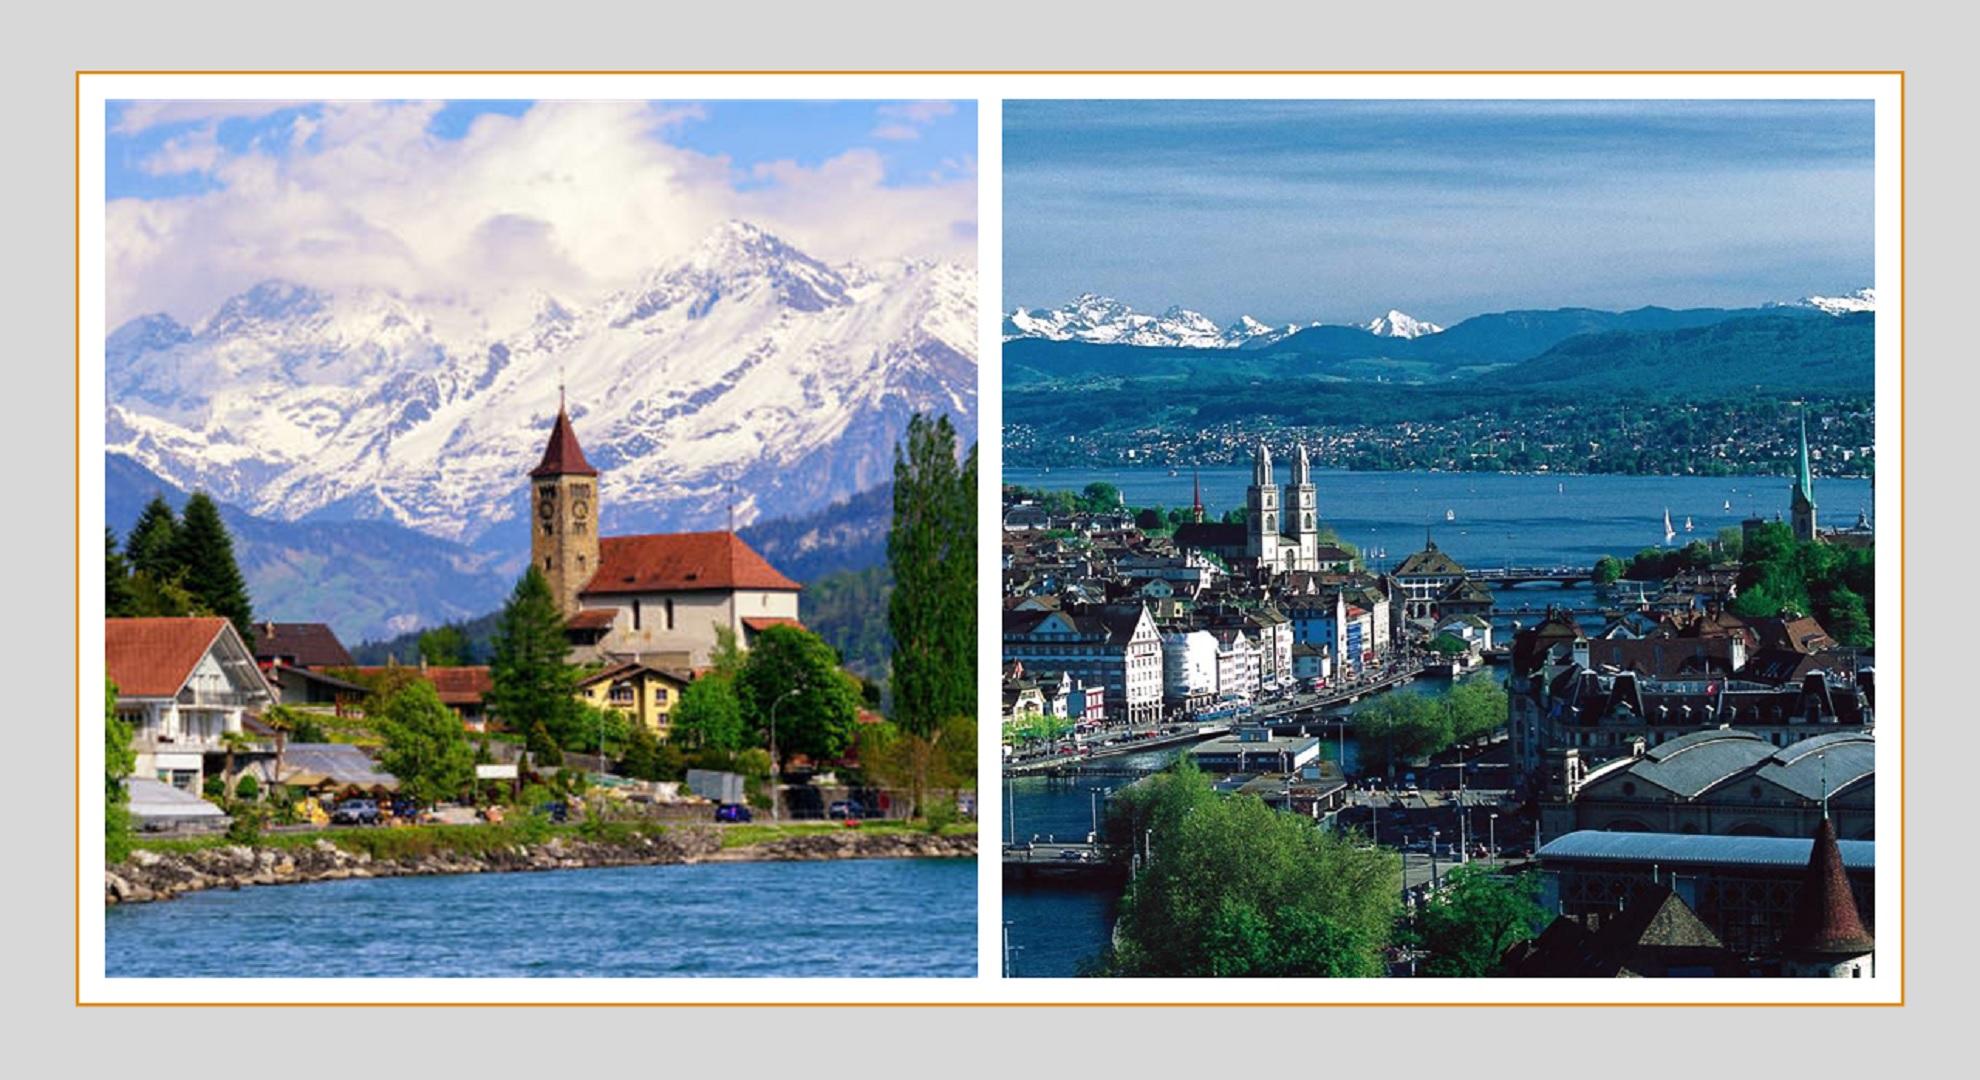 TOUR OF SWITZERLAND 7N / 8D